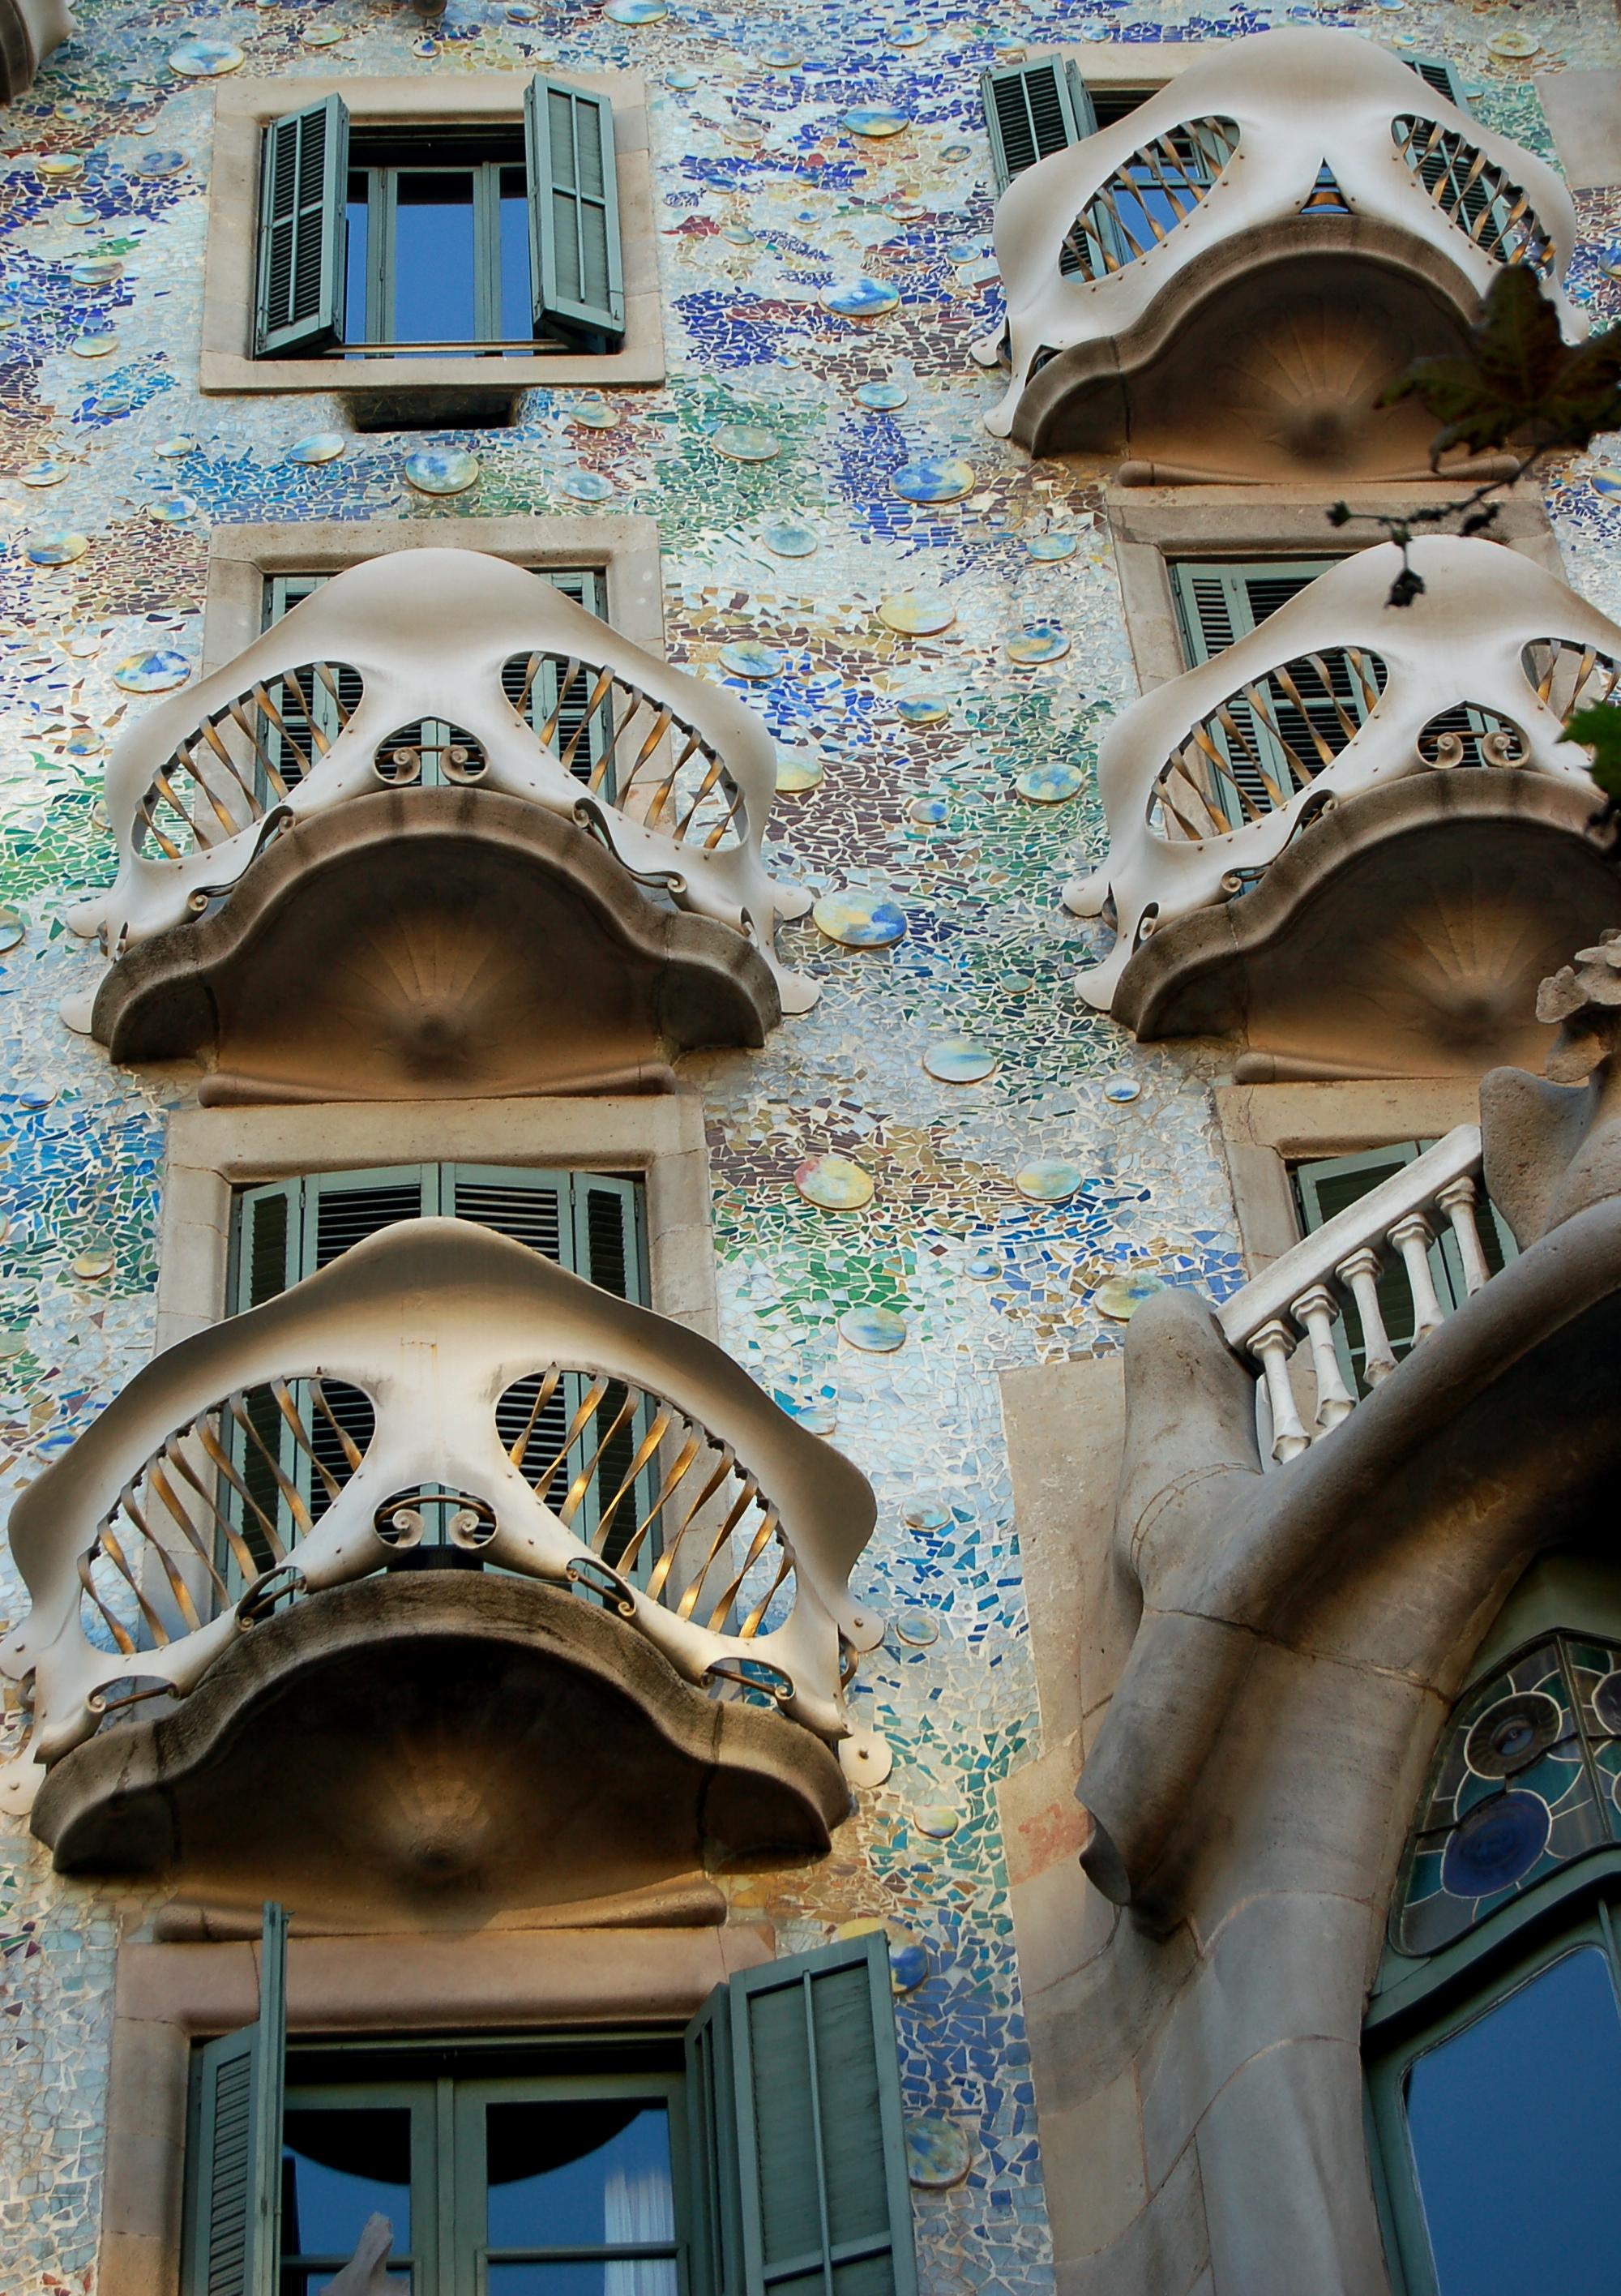 File:Casa Batllo.jpg - Wikimedia Commons